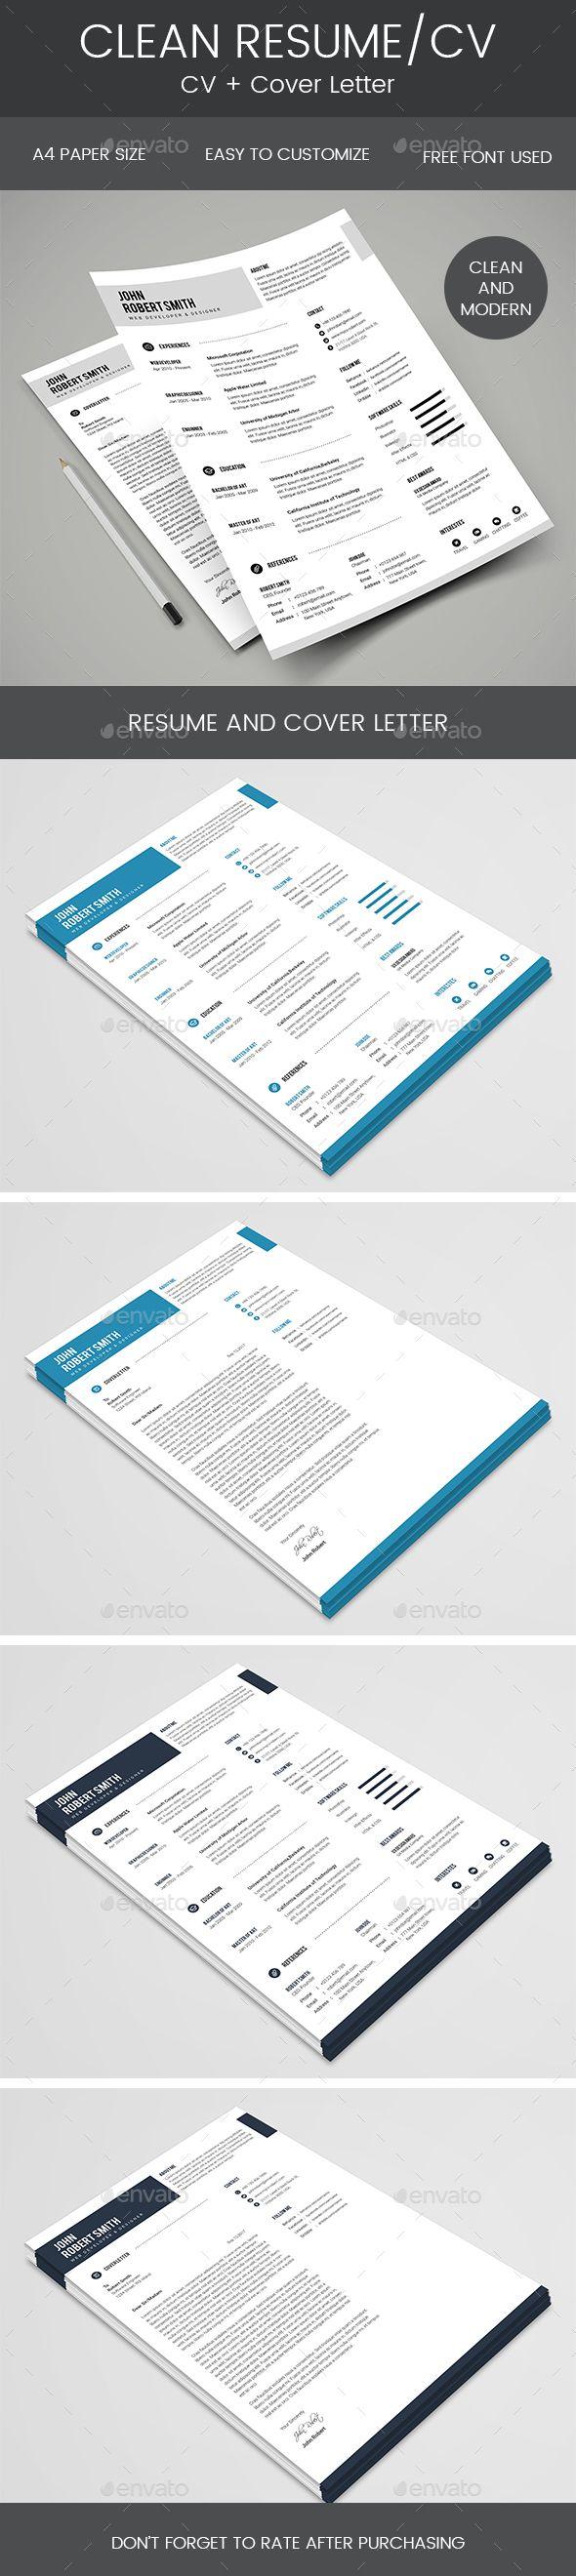 Clean Resume  Cover Letter  Cover Letter Resume Resume Cover